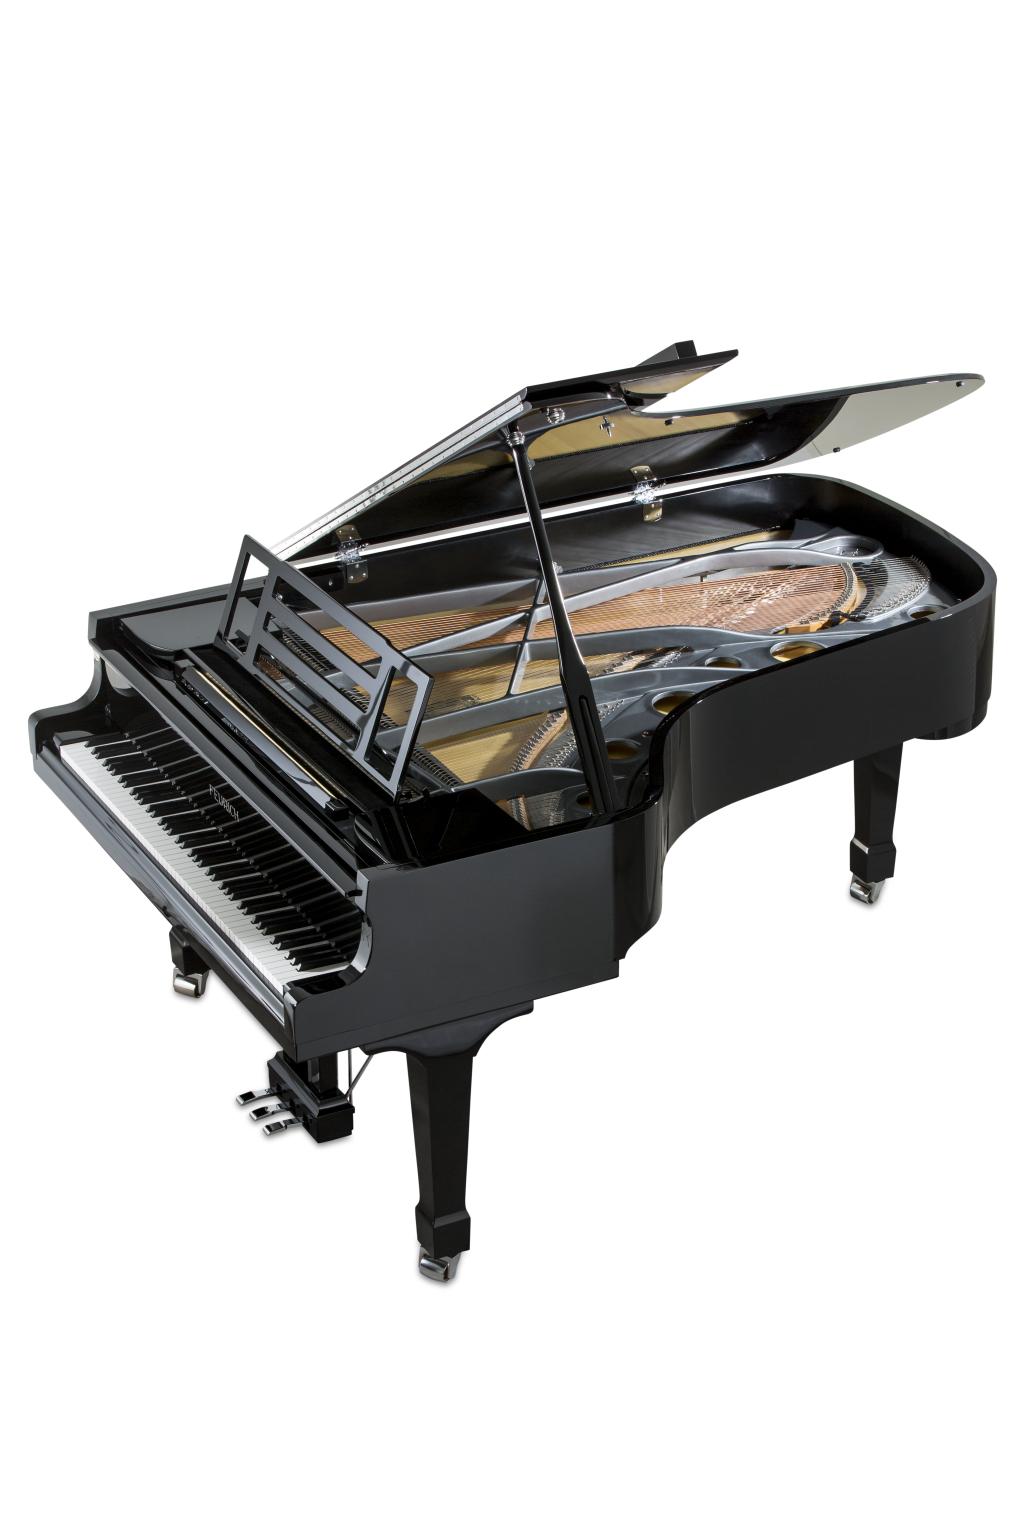 Feurich Klavier Mod. 218 Schwarz poliert - Messing